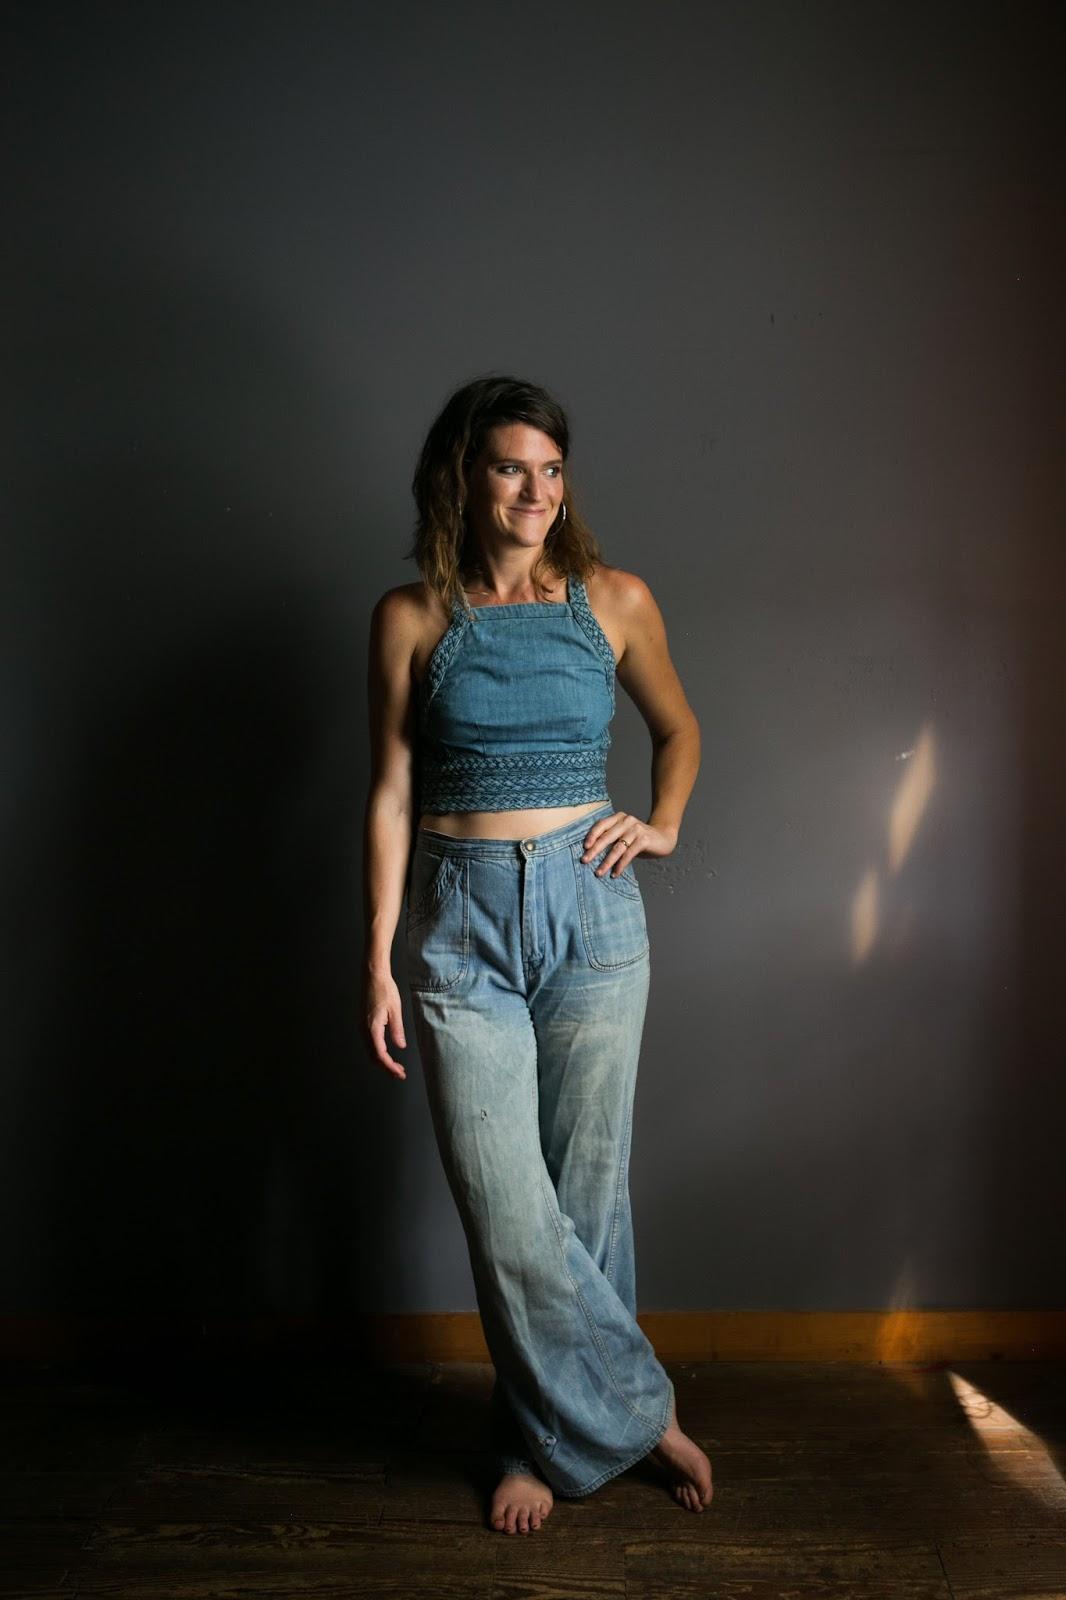 Erica Rivera Nude Photos